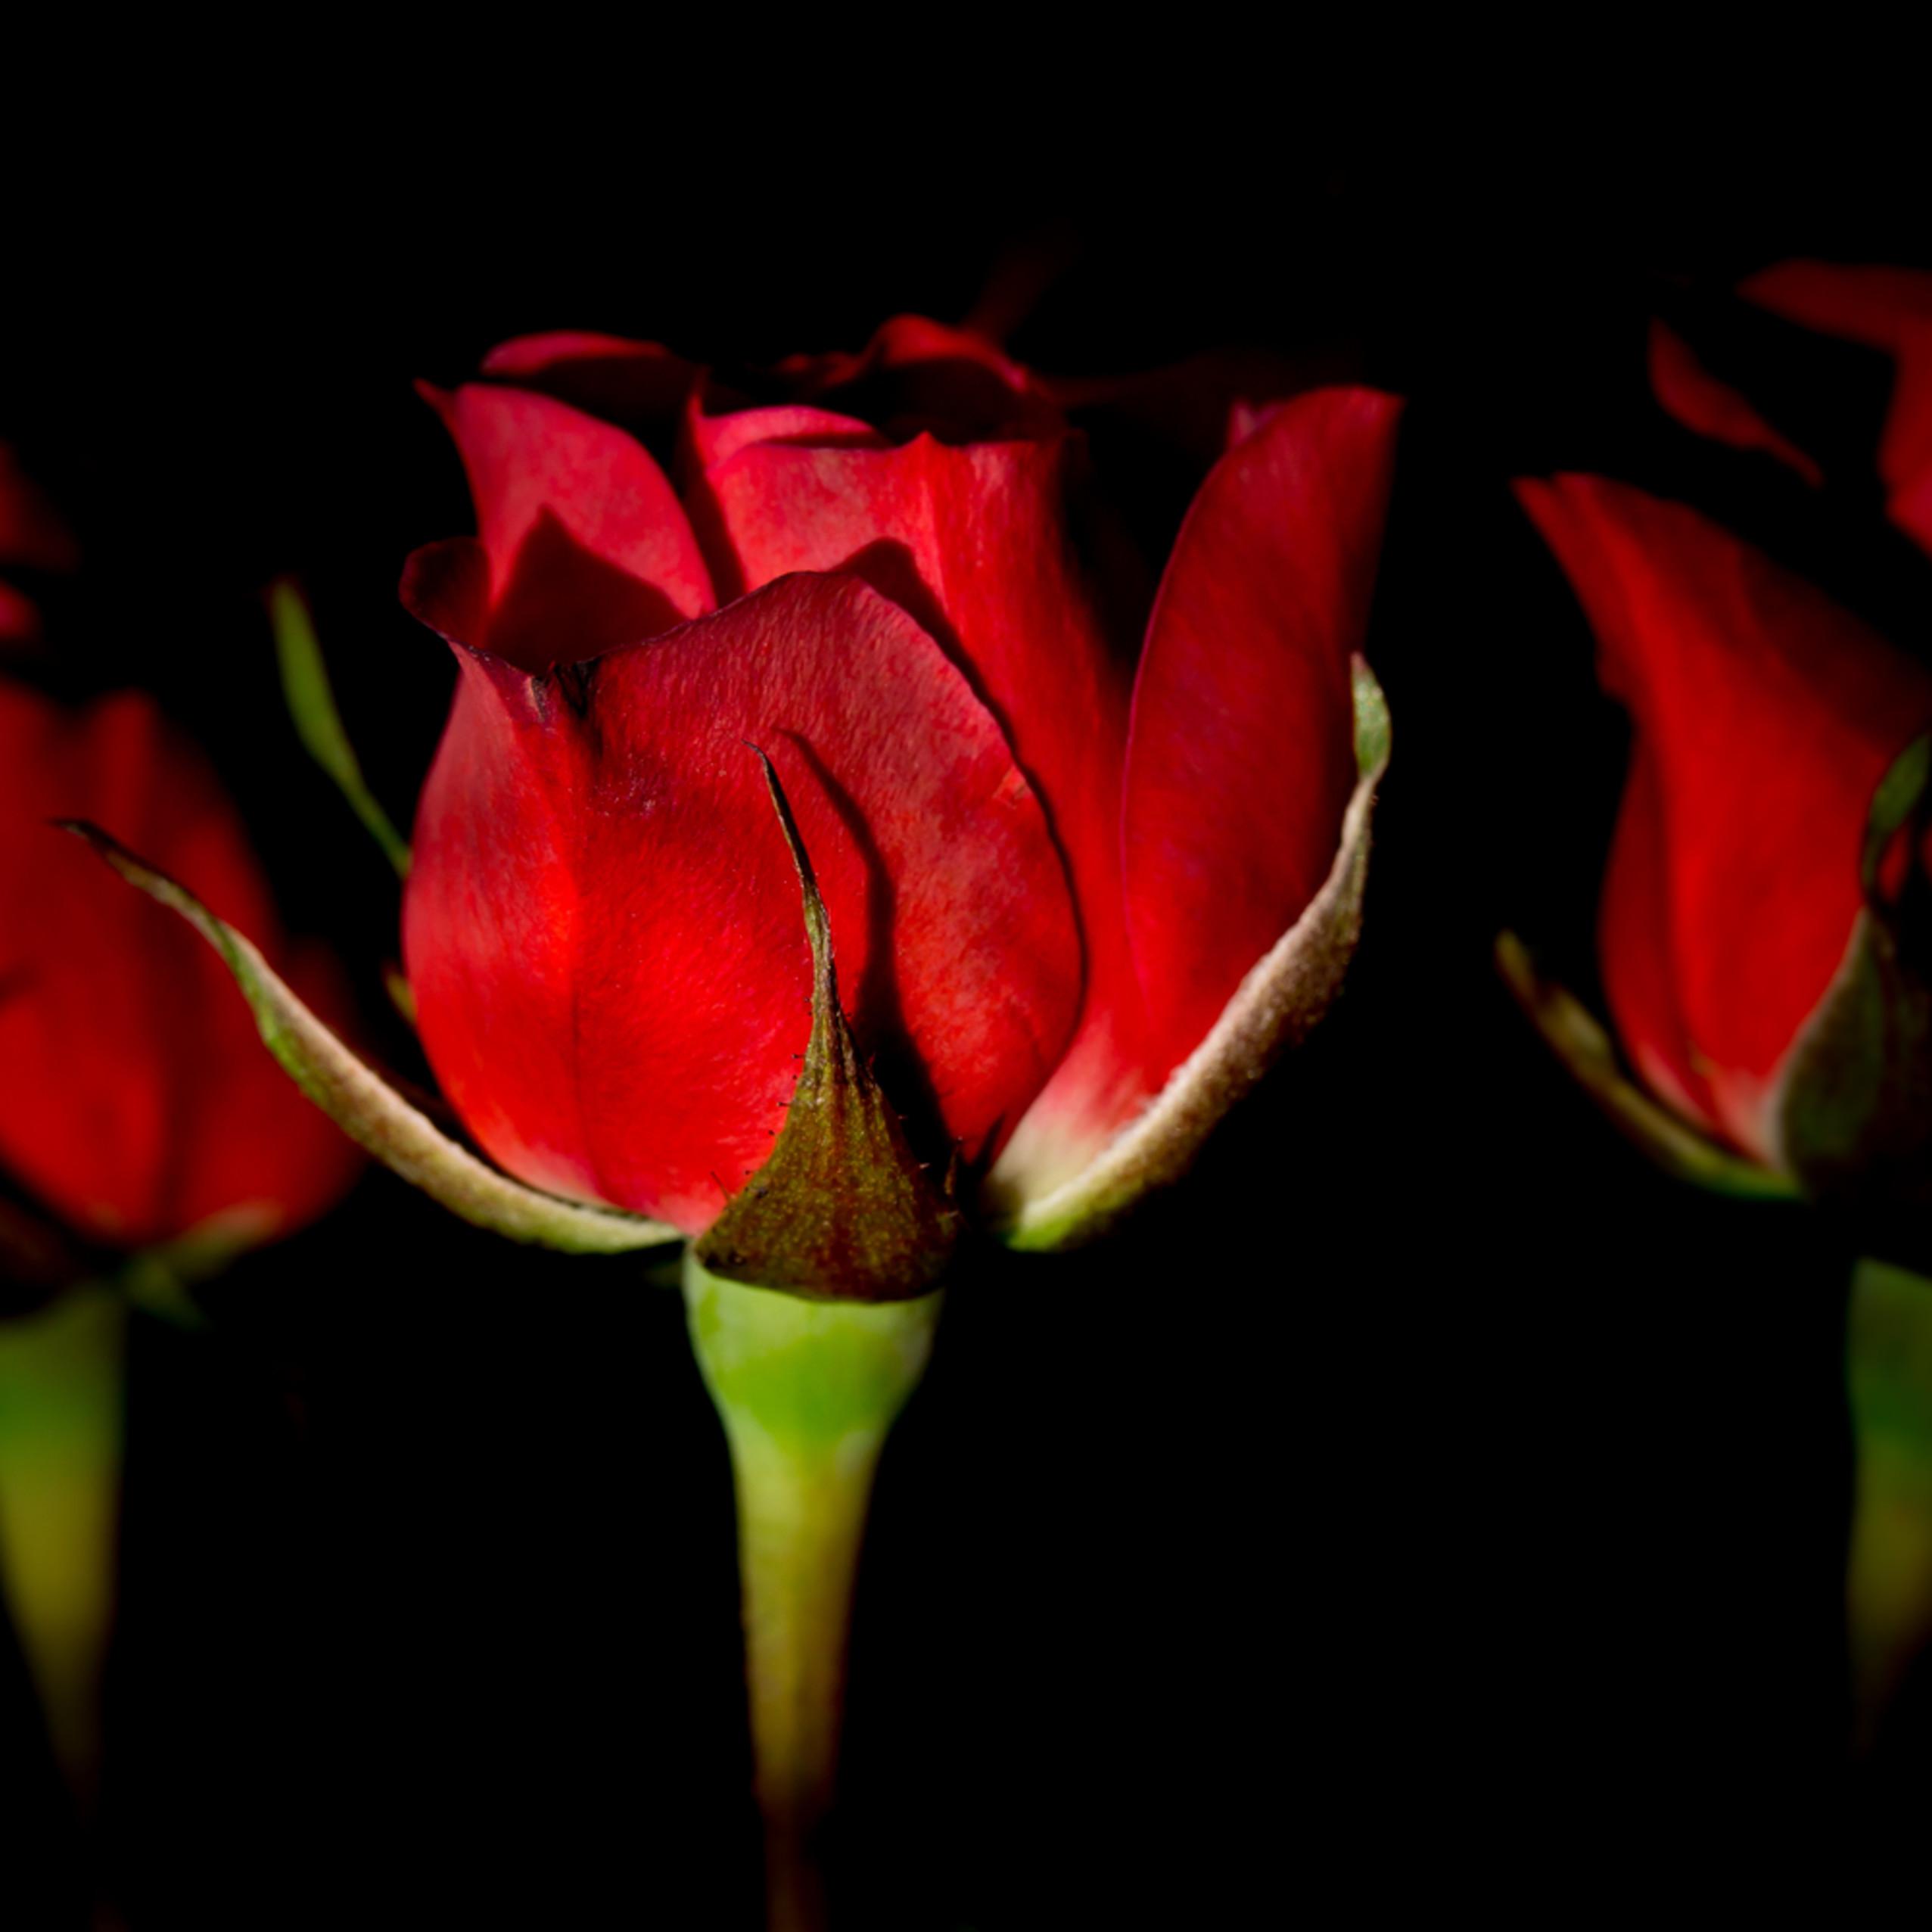 Roses 4x5 hr 9208 o0tujb